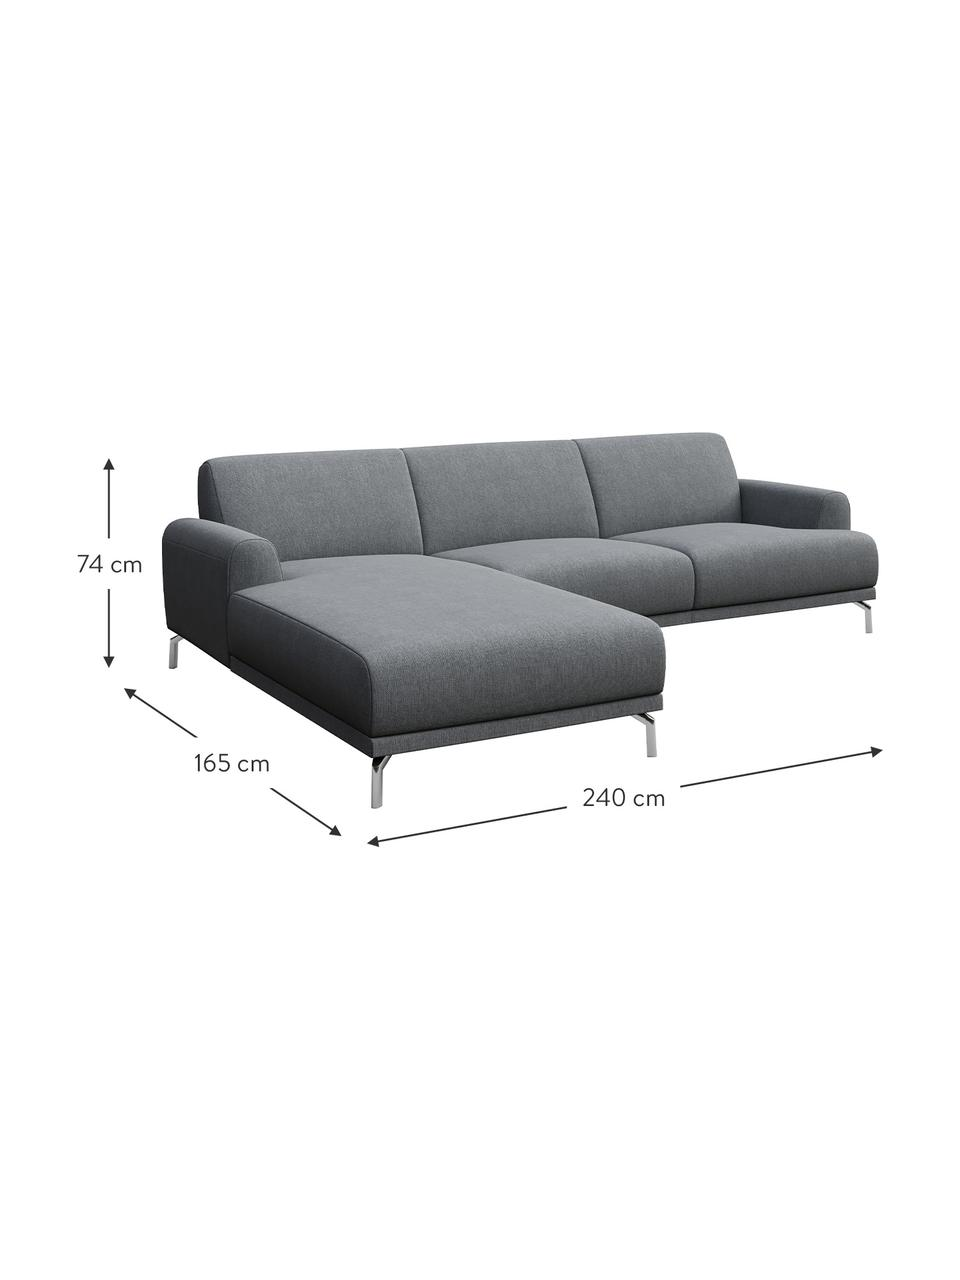 Sofa narożna Puzo, Tapicerka: 100% poliester, Nogi: metal lakierowany, Jasny szary, S 240 x G 165 cm